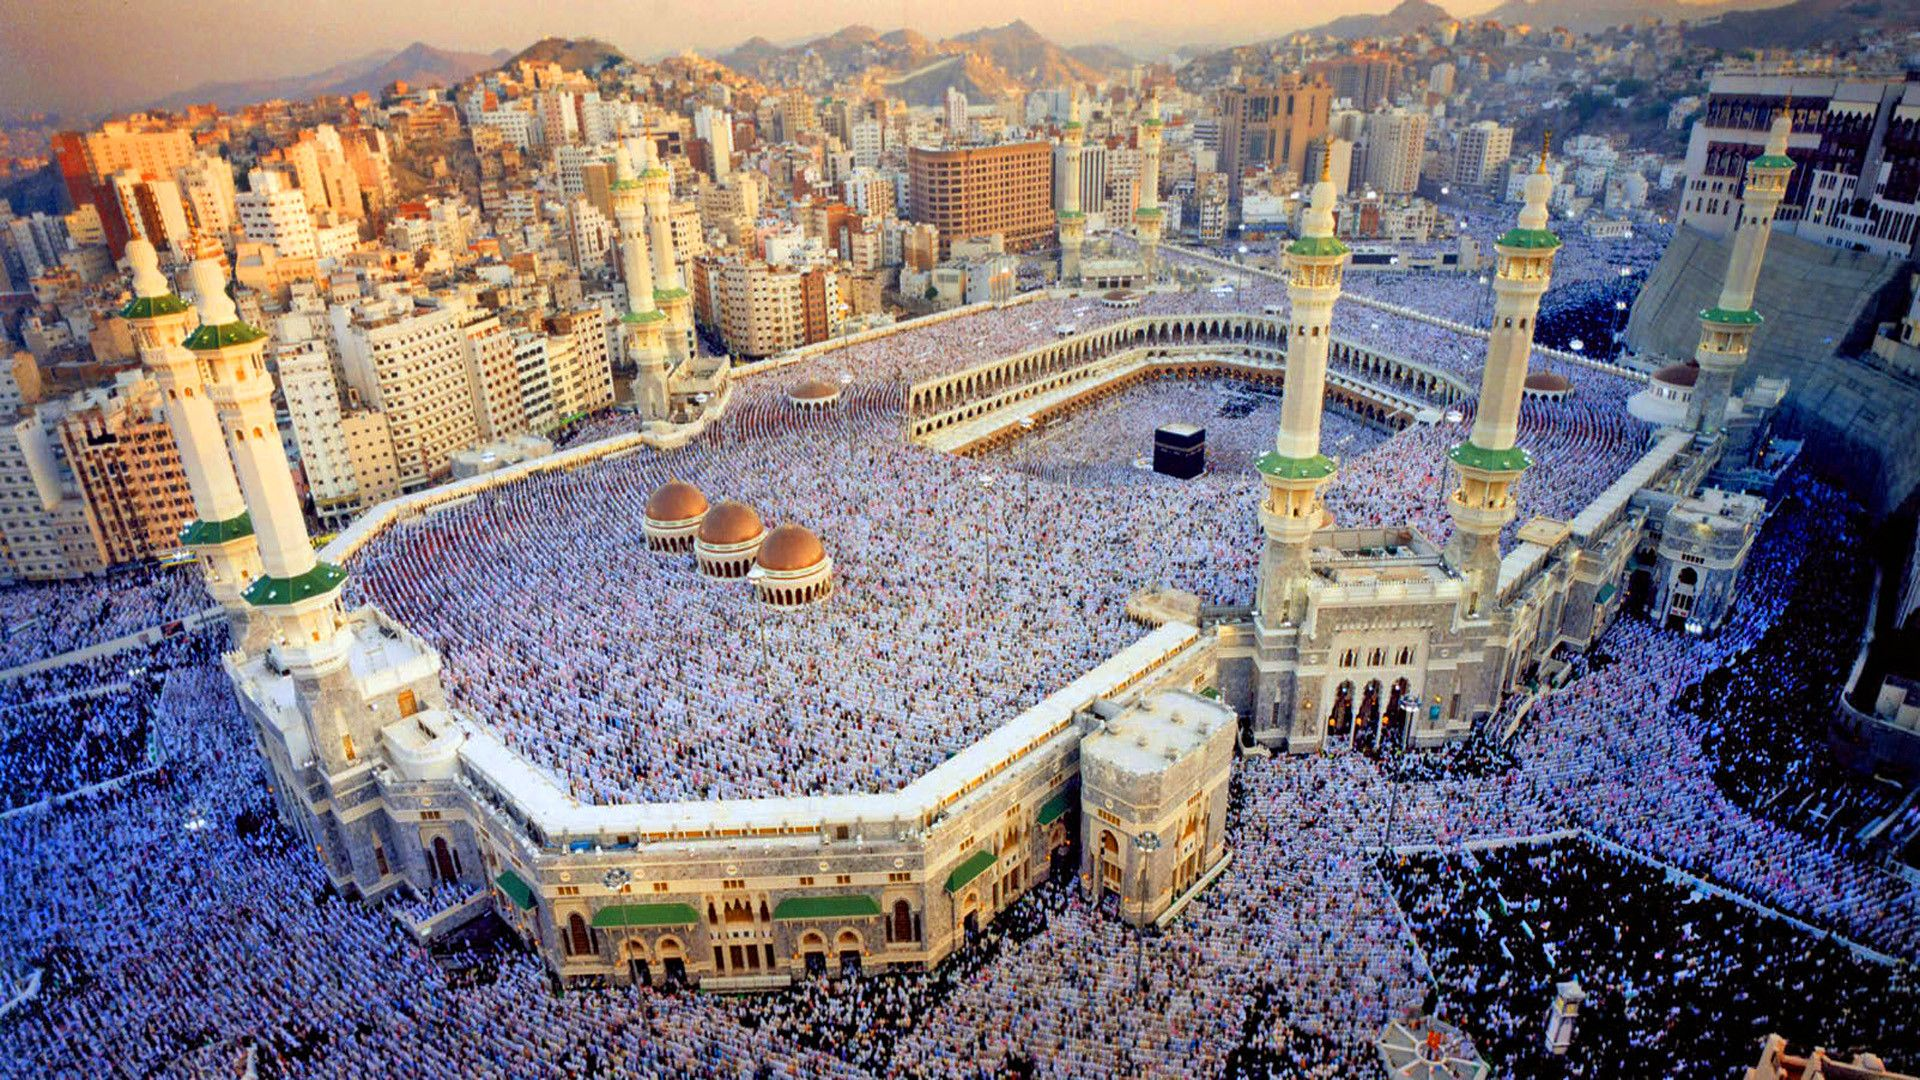 Res 1920x1080 A 1366x768 Mecca Kaaba Mecca Mecca Wallpaper